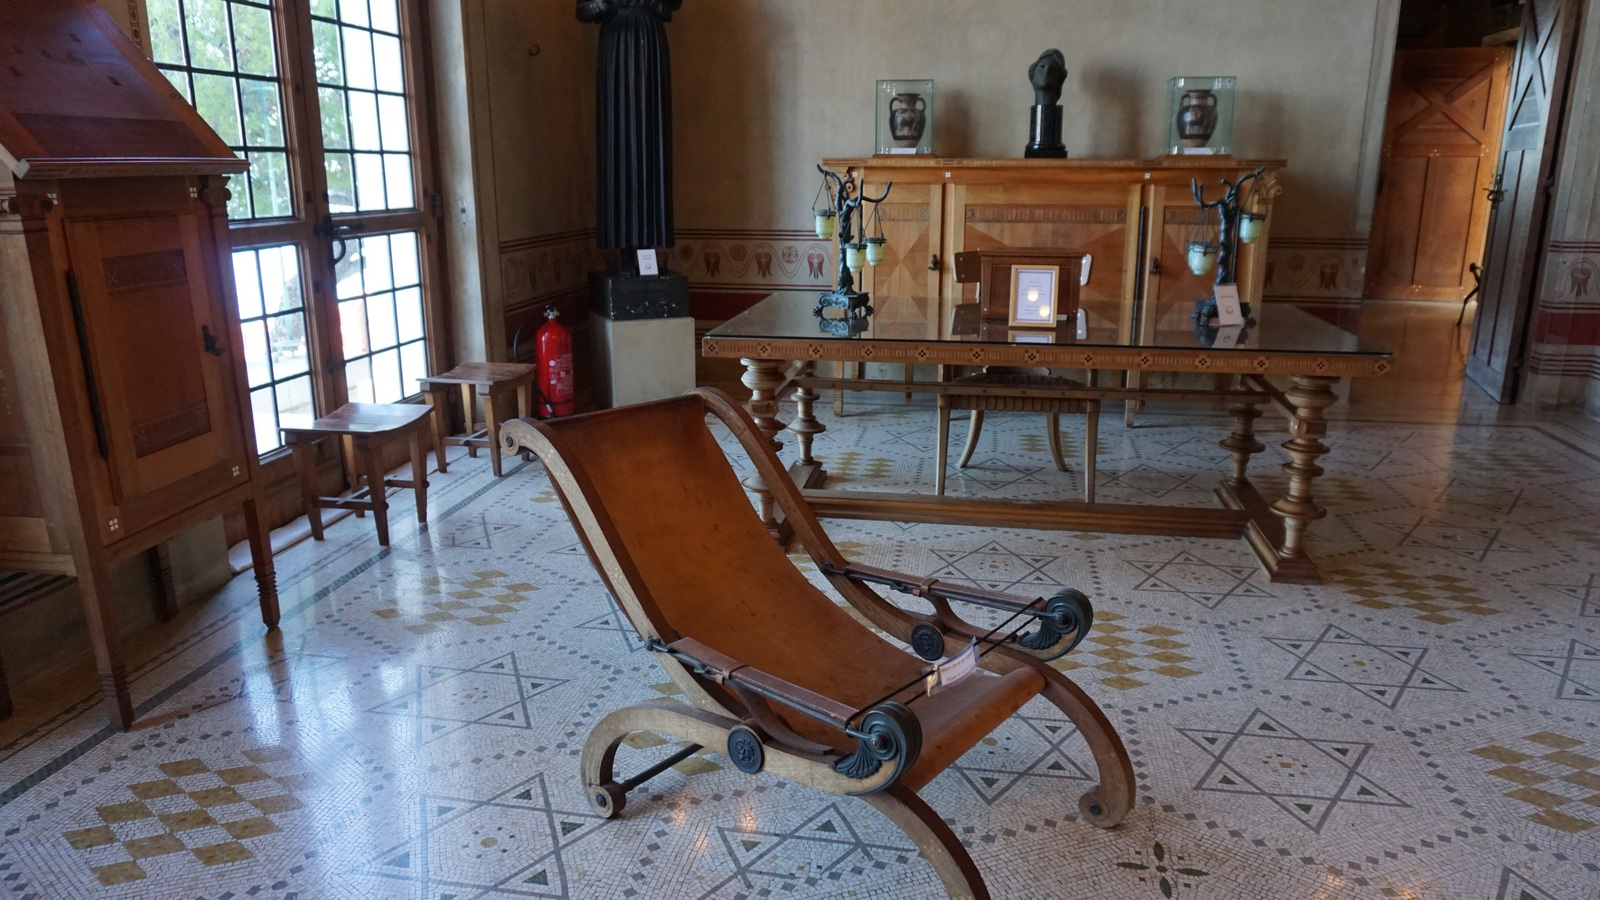 Library in Villa Kerylos